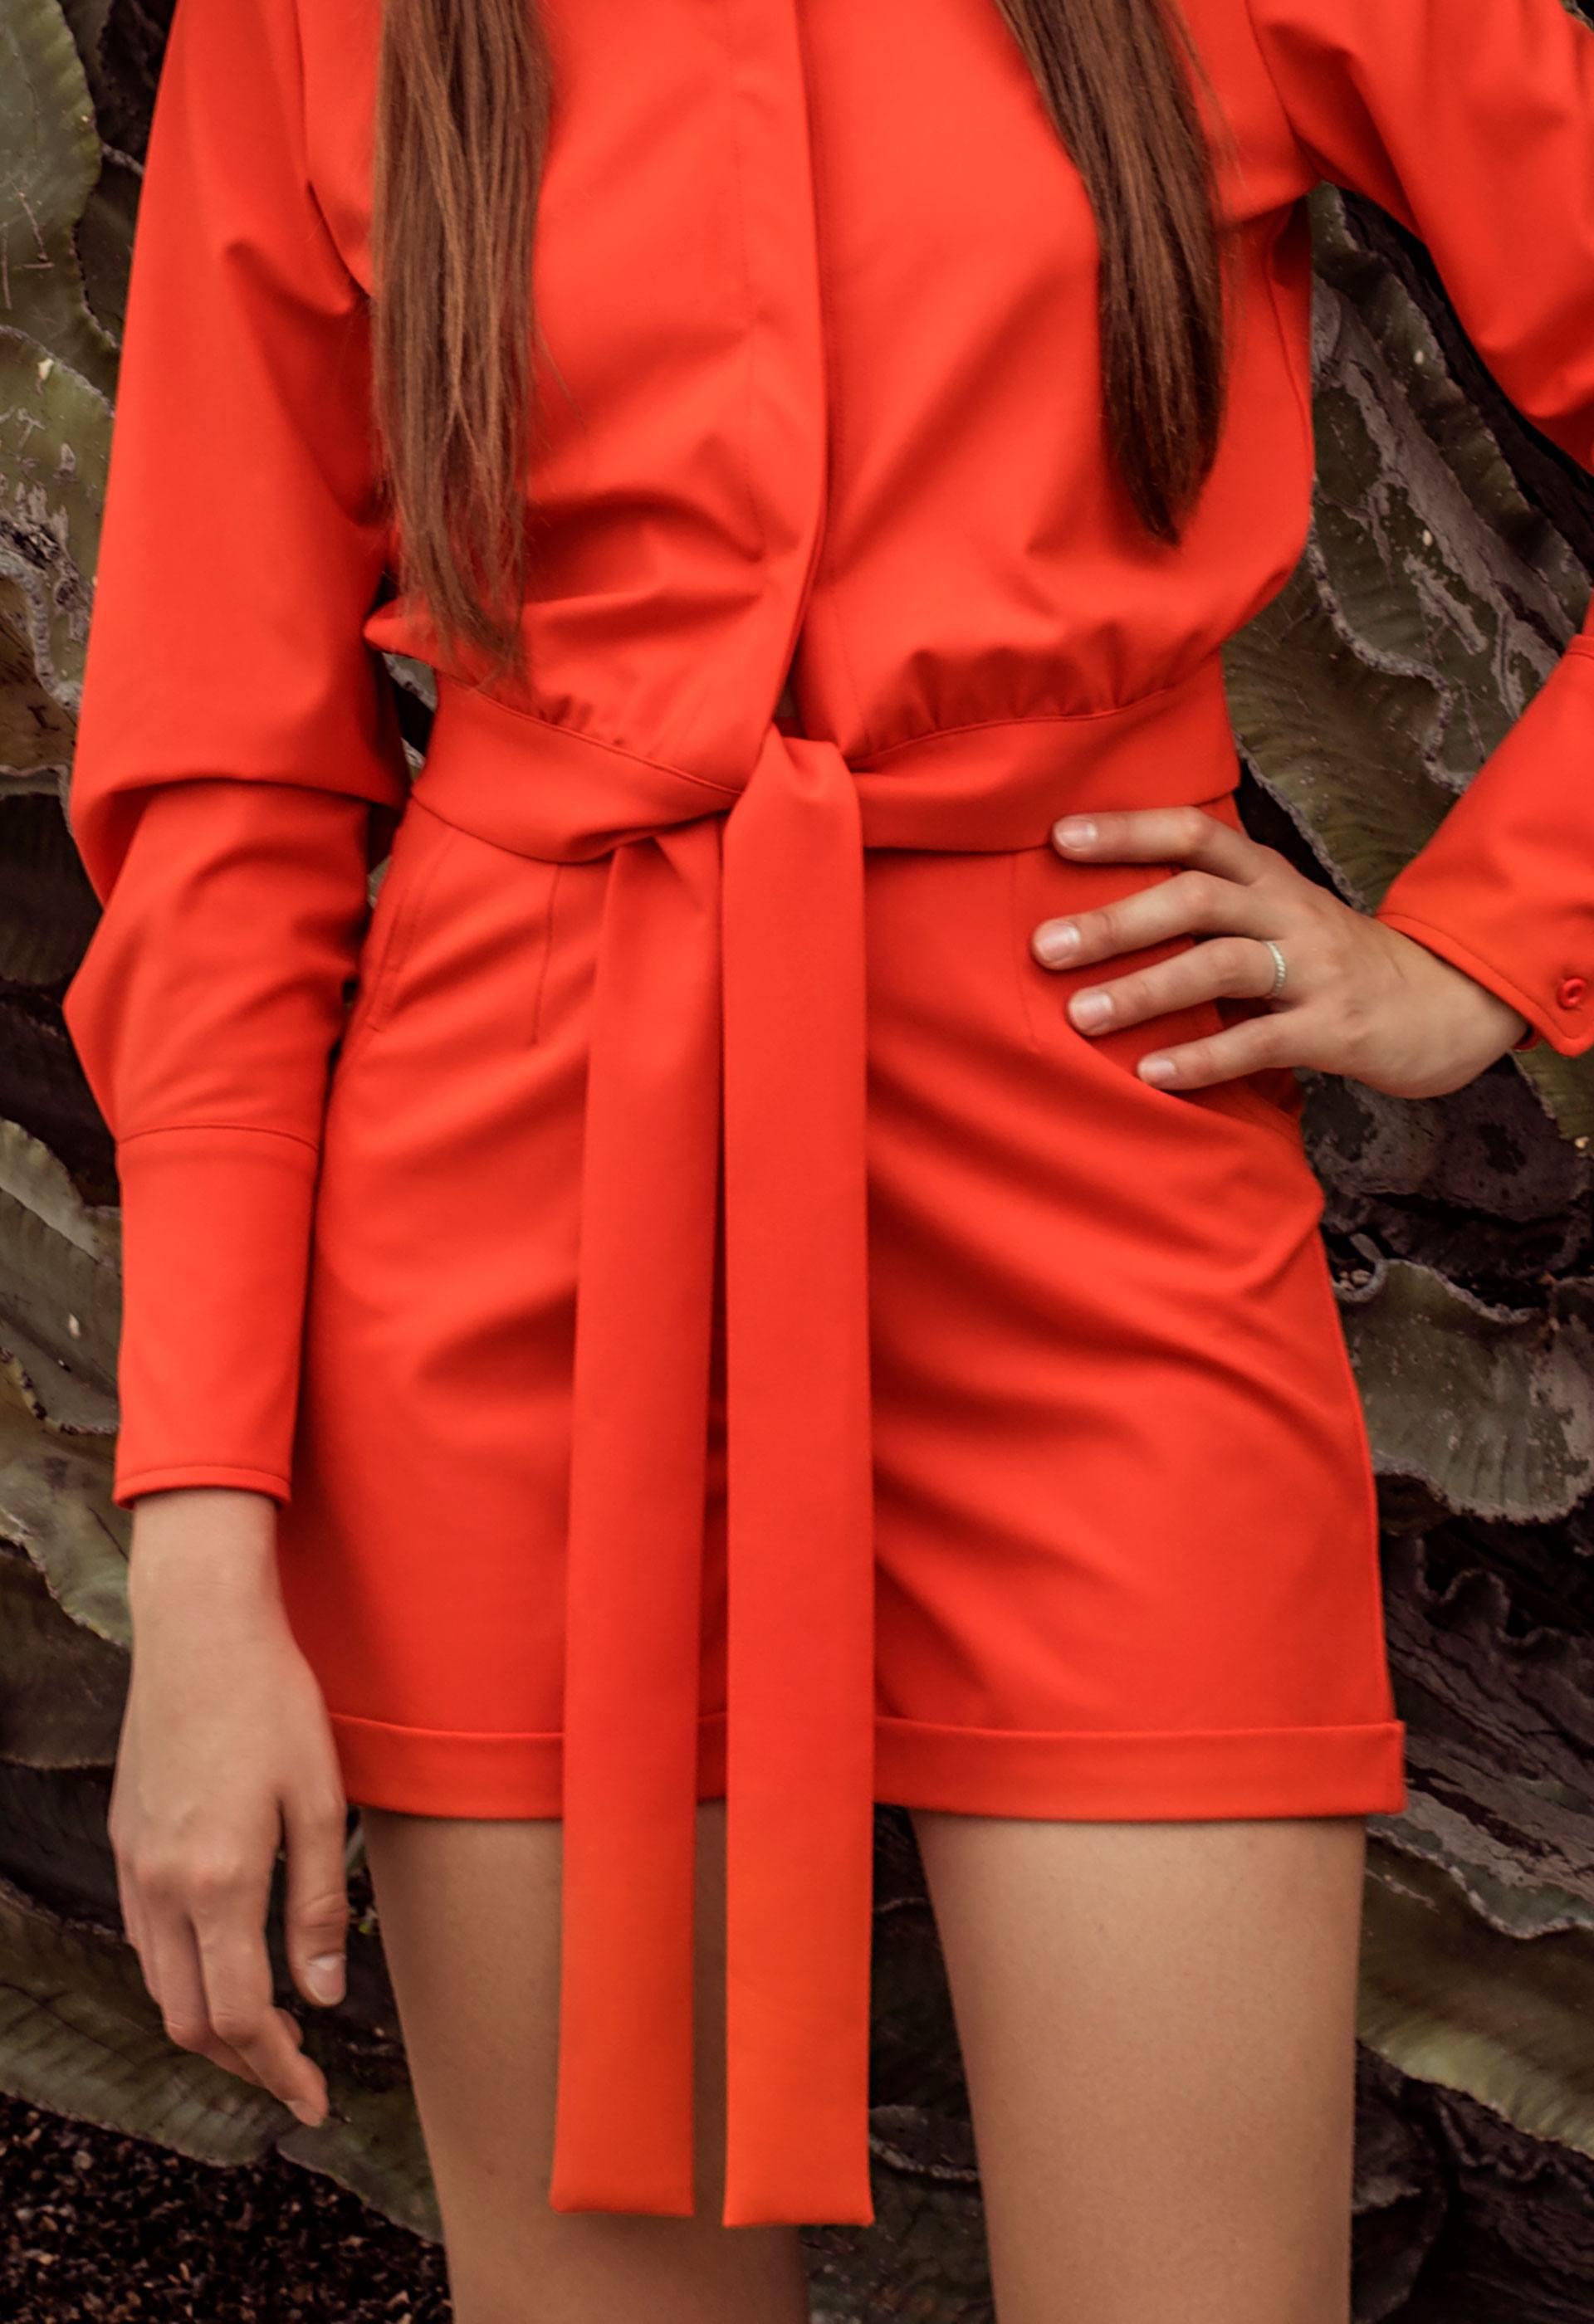 Pantalón corto con dobladillo tipo tejano naranja